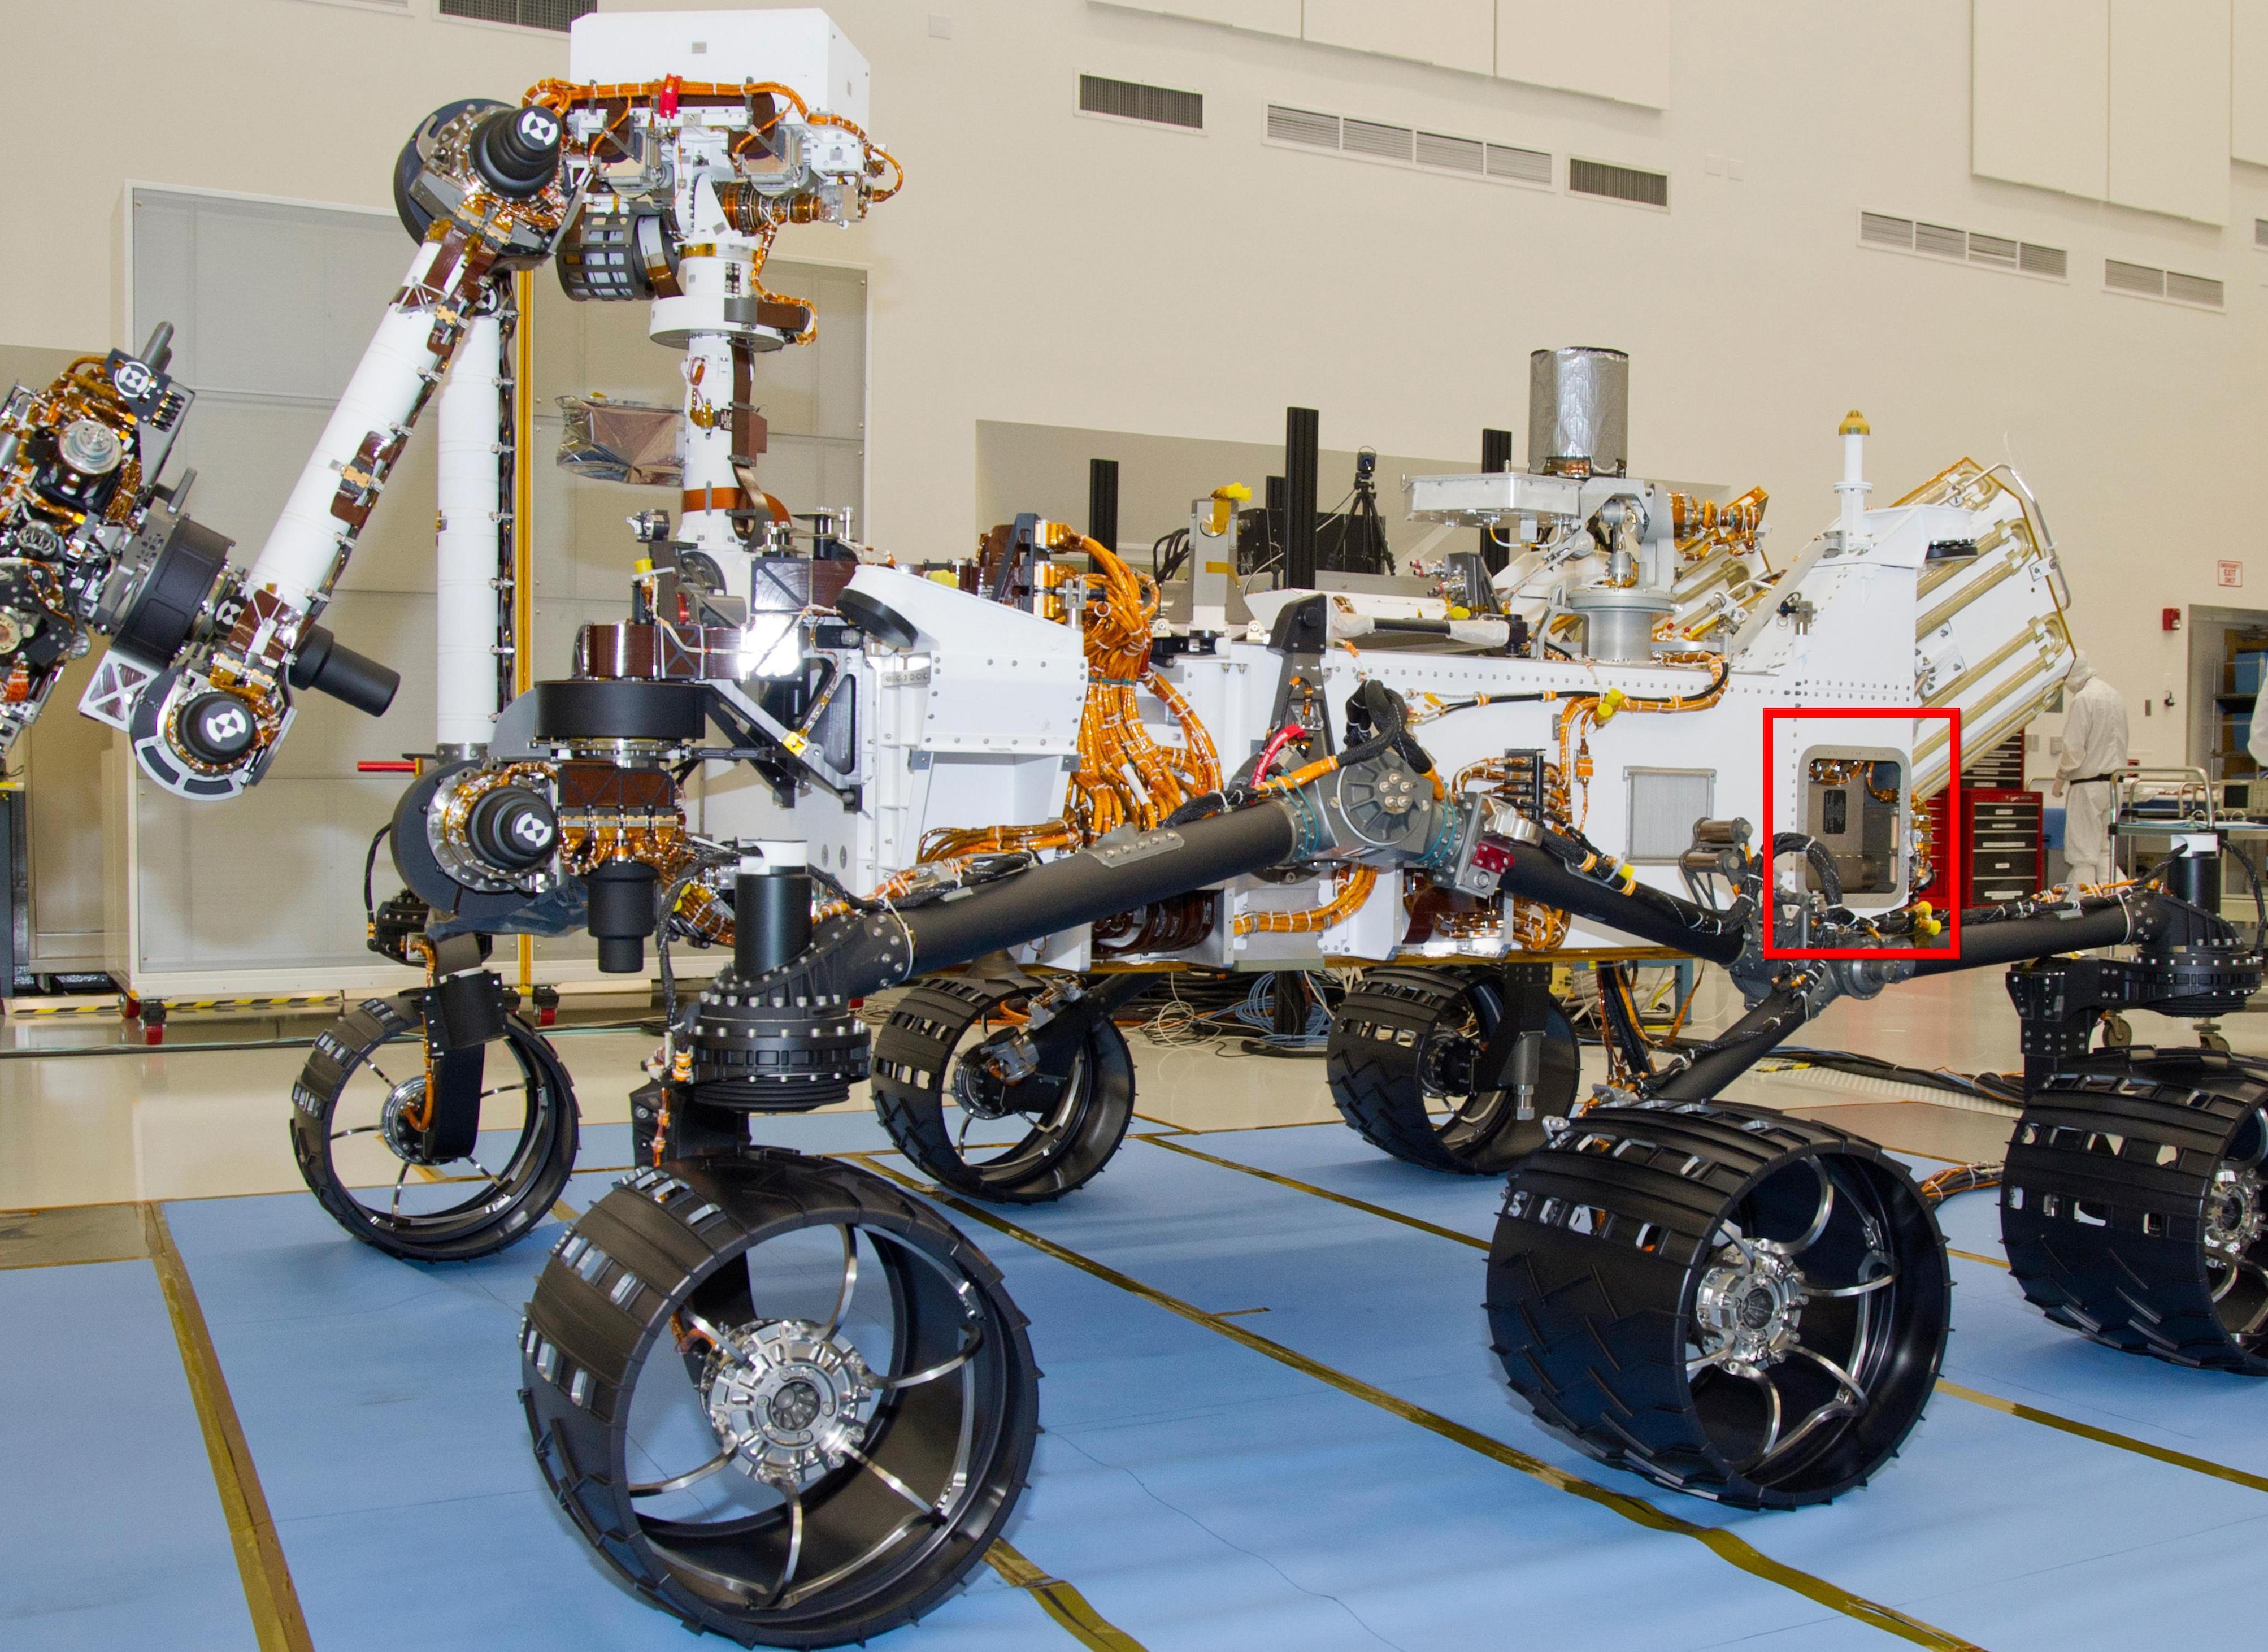 mars rover javascript ironhack - photo #11